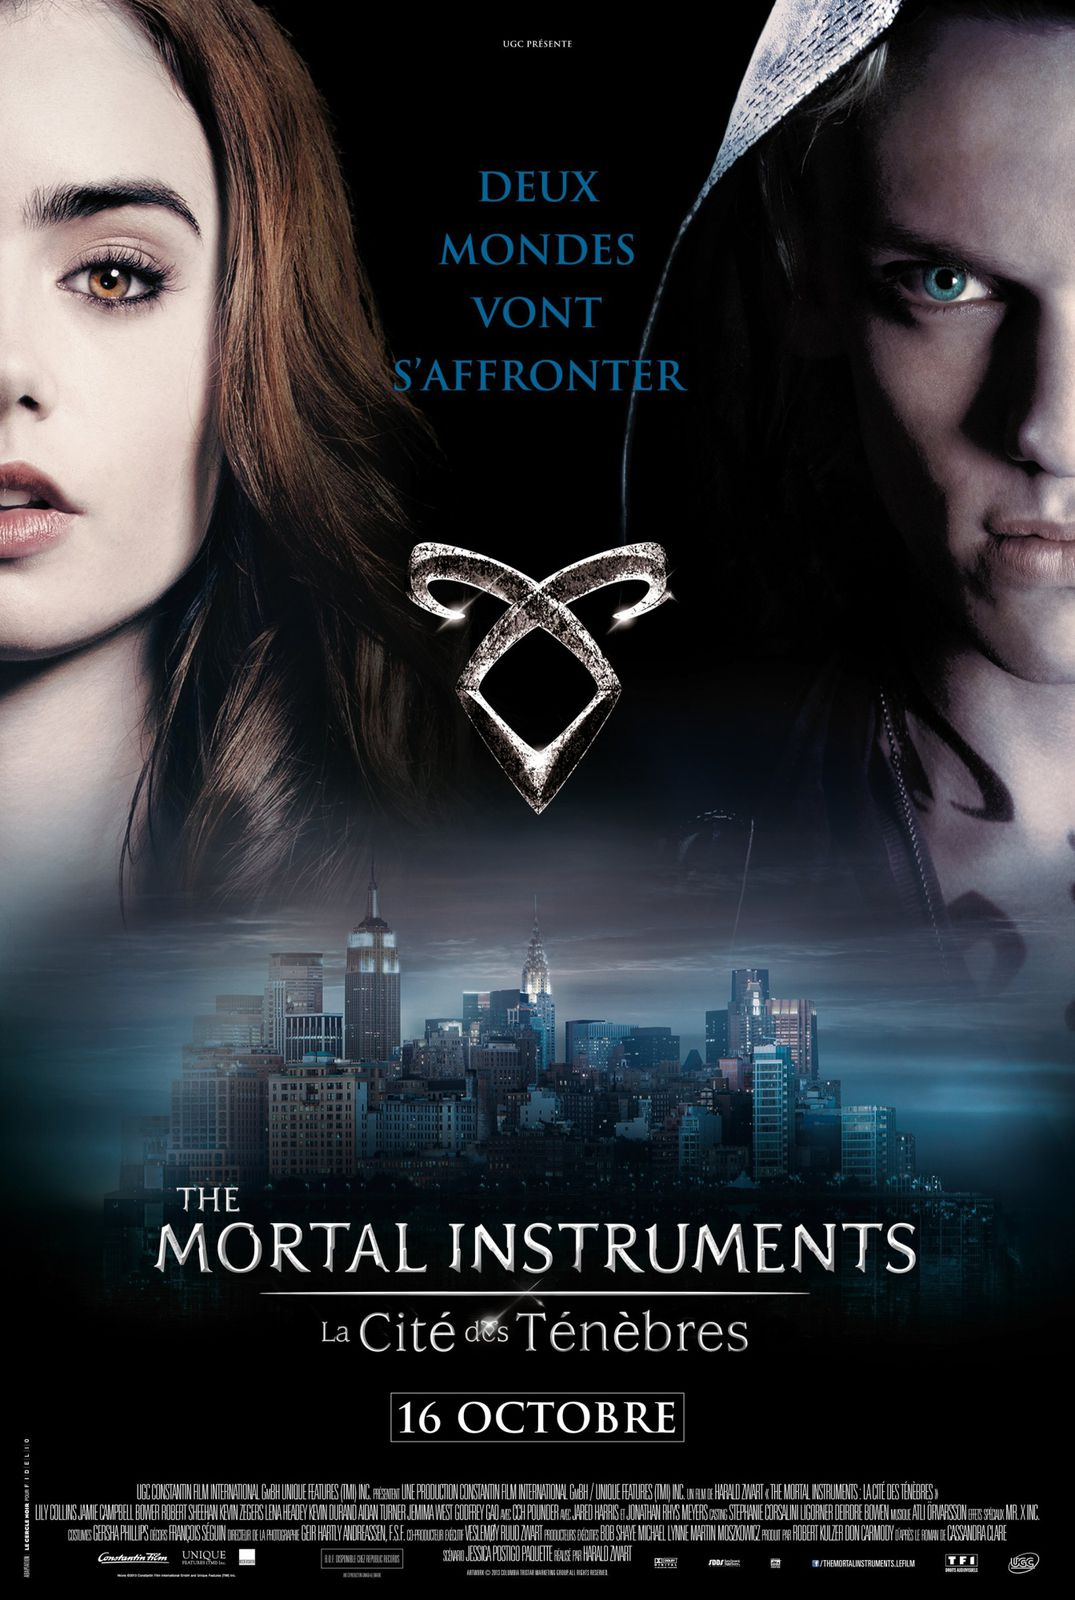 [critique] The Mortal Instruments : La Cité des ténèbres